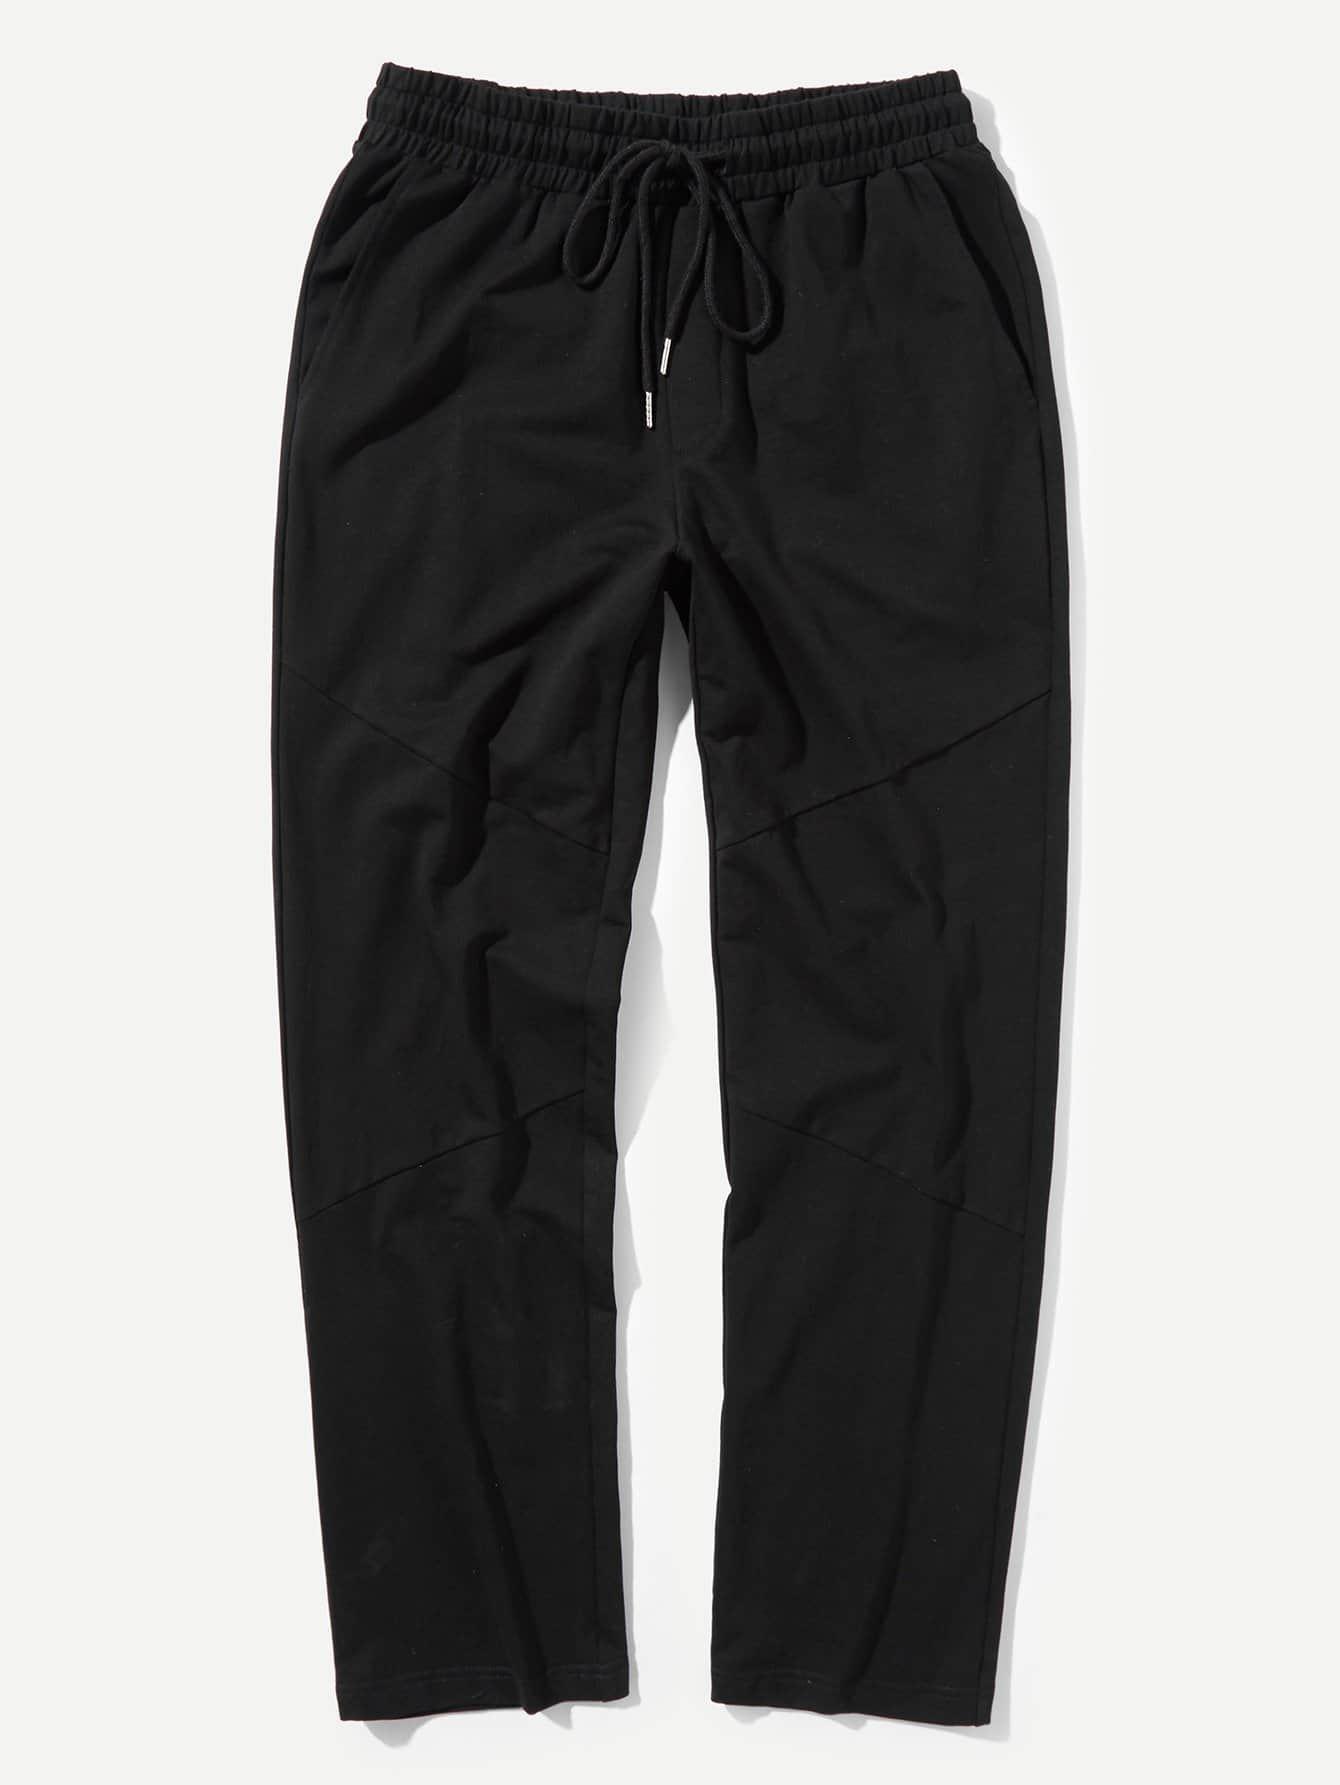 Мужчины Drawstring Талия Slant Карманные брюки